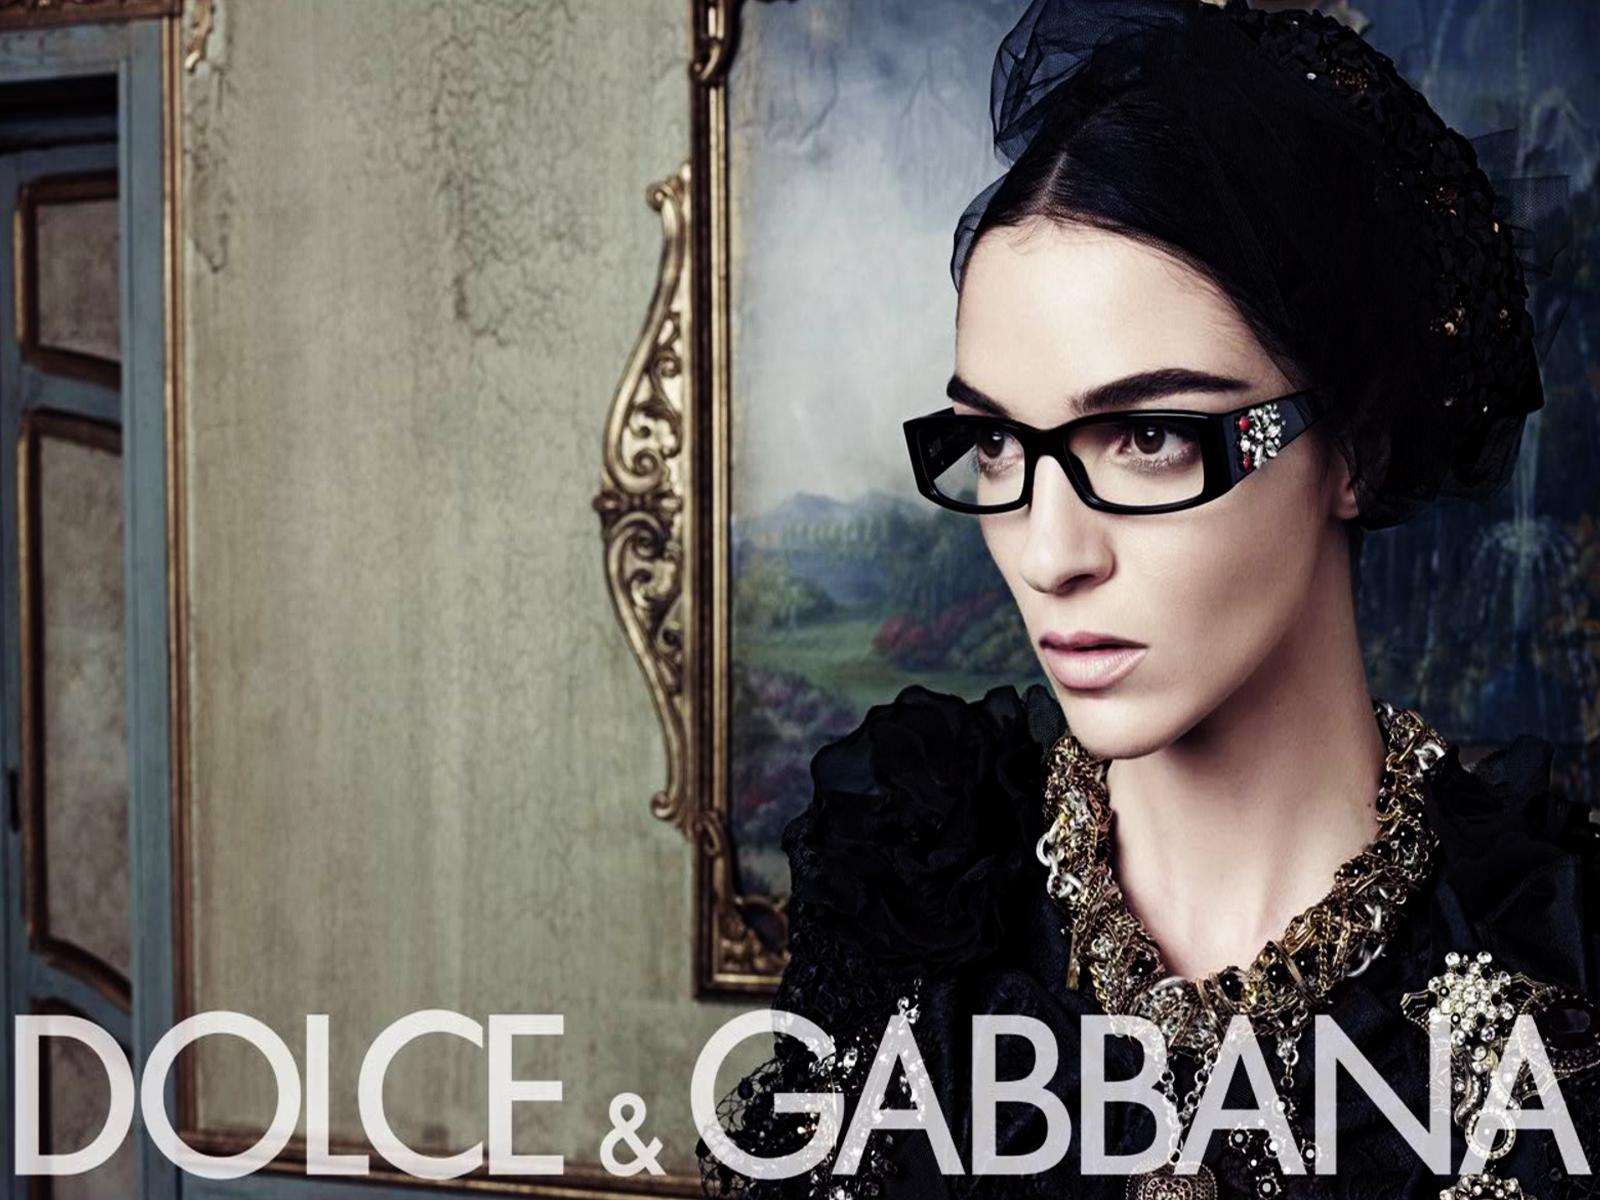 dolce gabbana fashion ads wallpaper my image. Black Bedroom Furniture Sets. Home Design Ideas